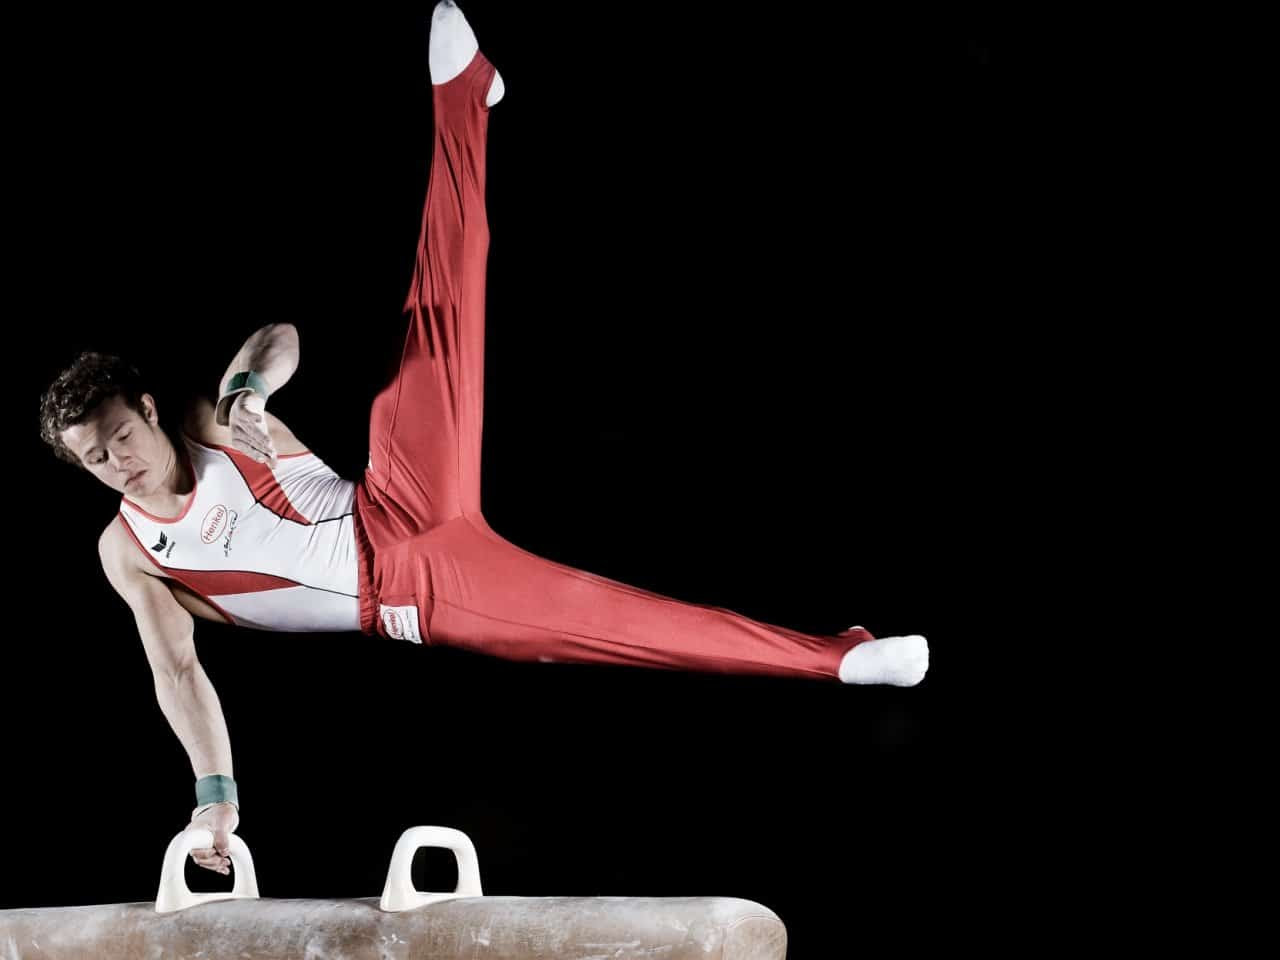 Aparatos de gimnasia rítmica: masculina y femenina